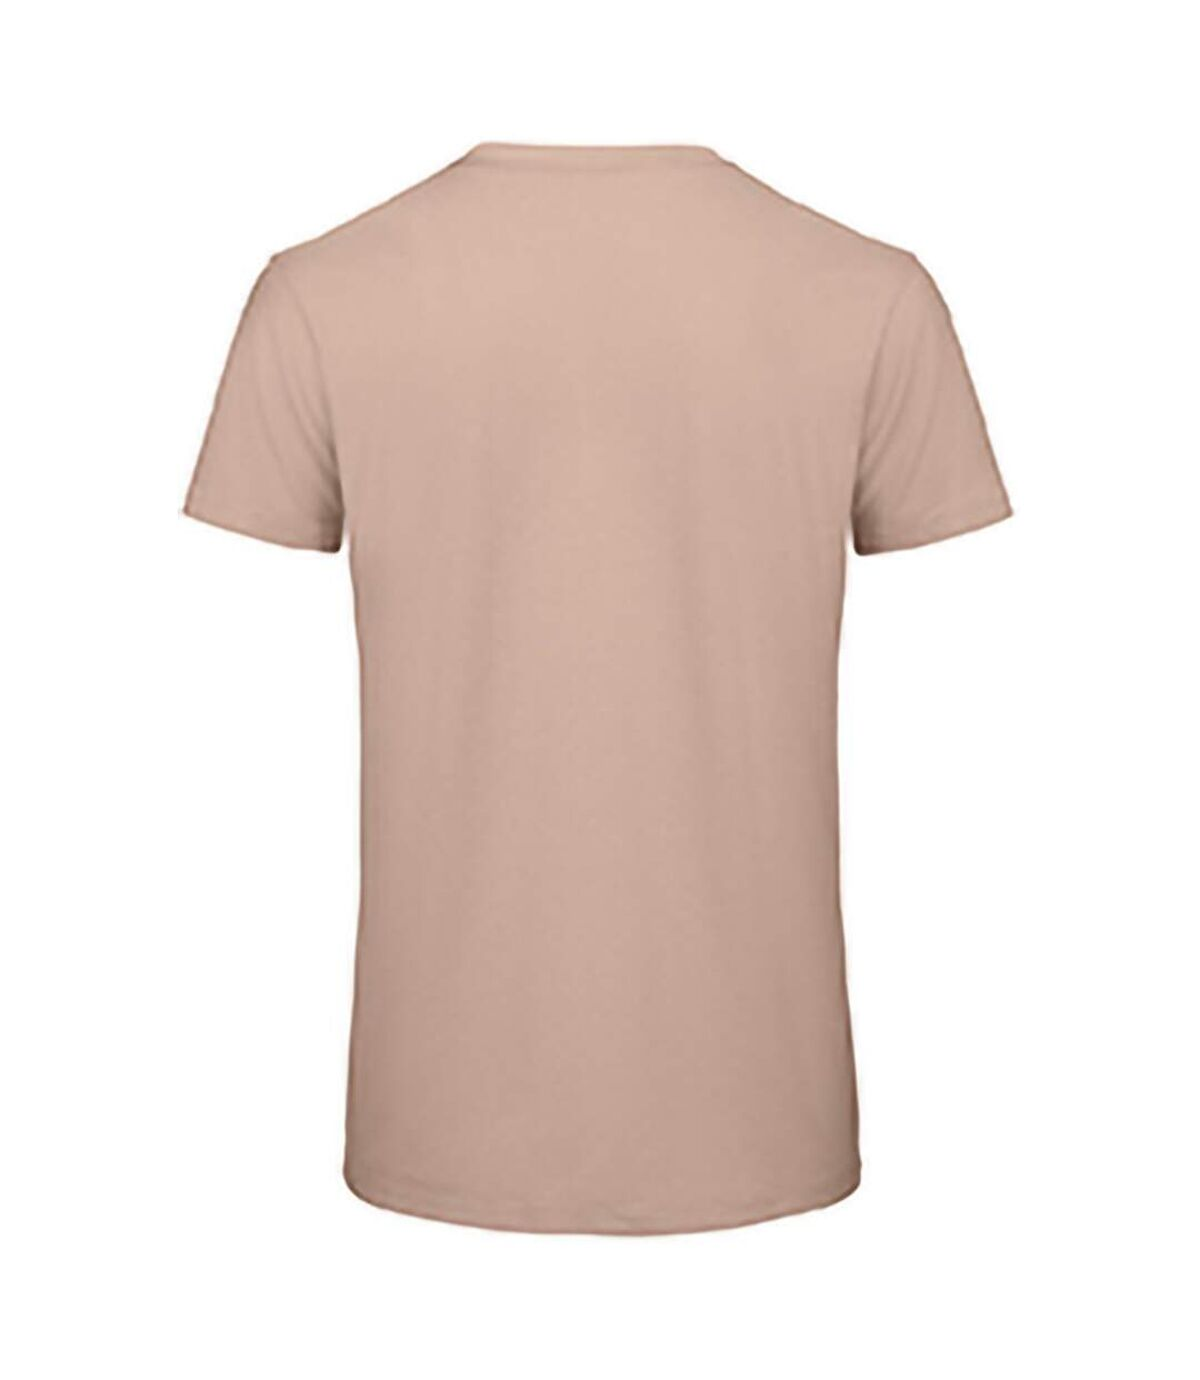 B&C Mens Favourite Organic Cotton Crew T-Shirt (Millennial Khaki) - UTBC3635